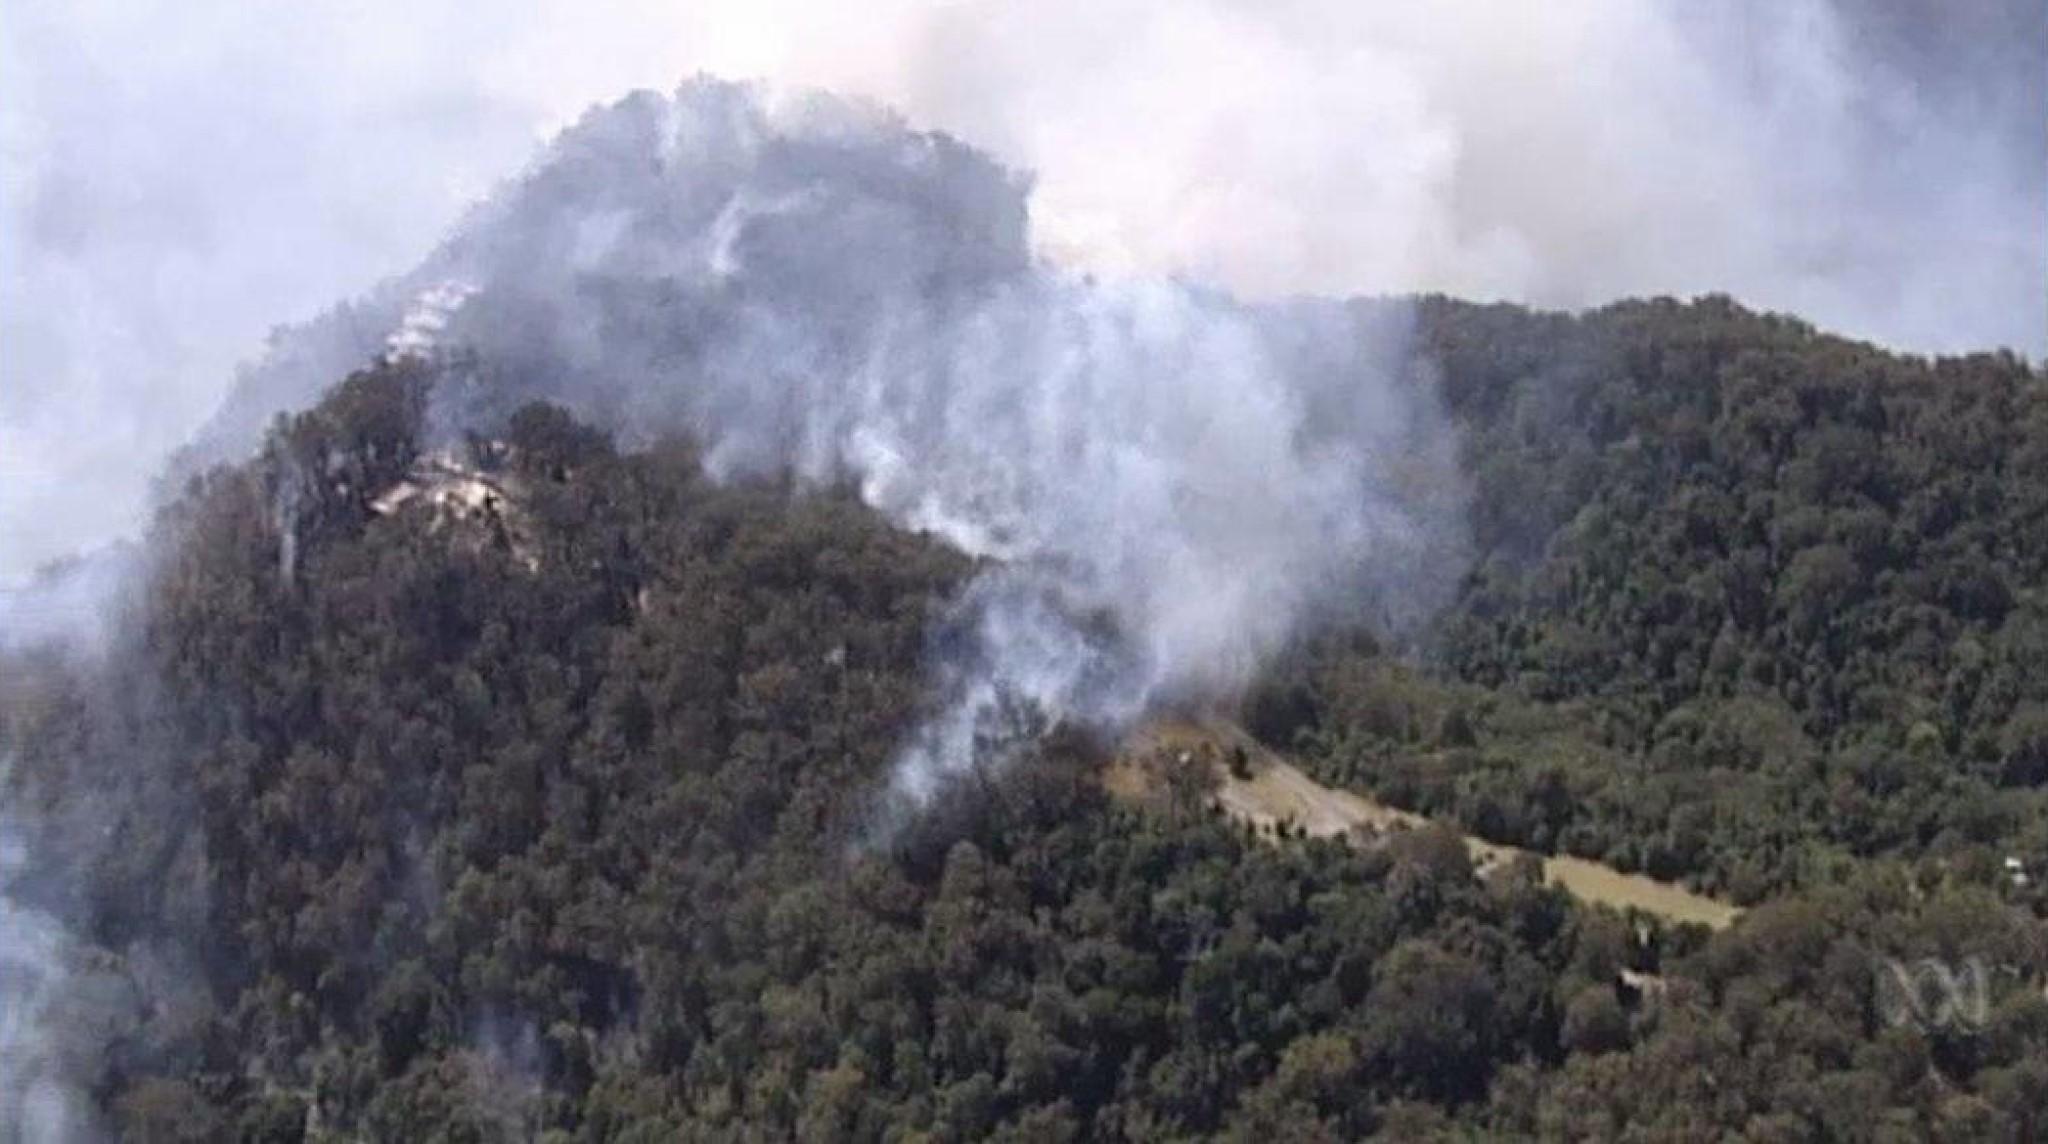 Wildfires spreading across the Binna Burra cultural landscape. Photo: Binna Burra Lodge